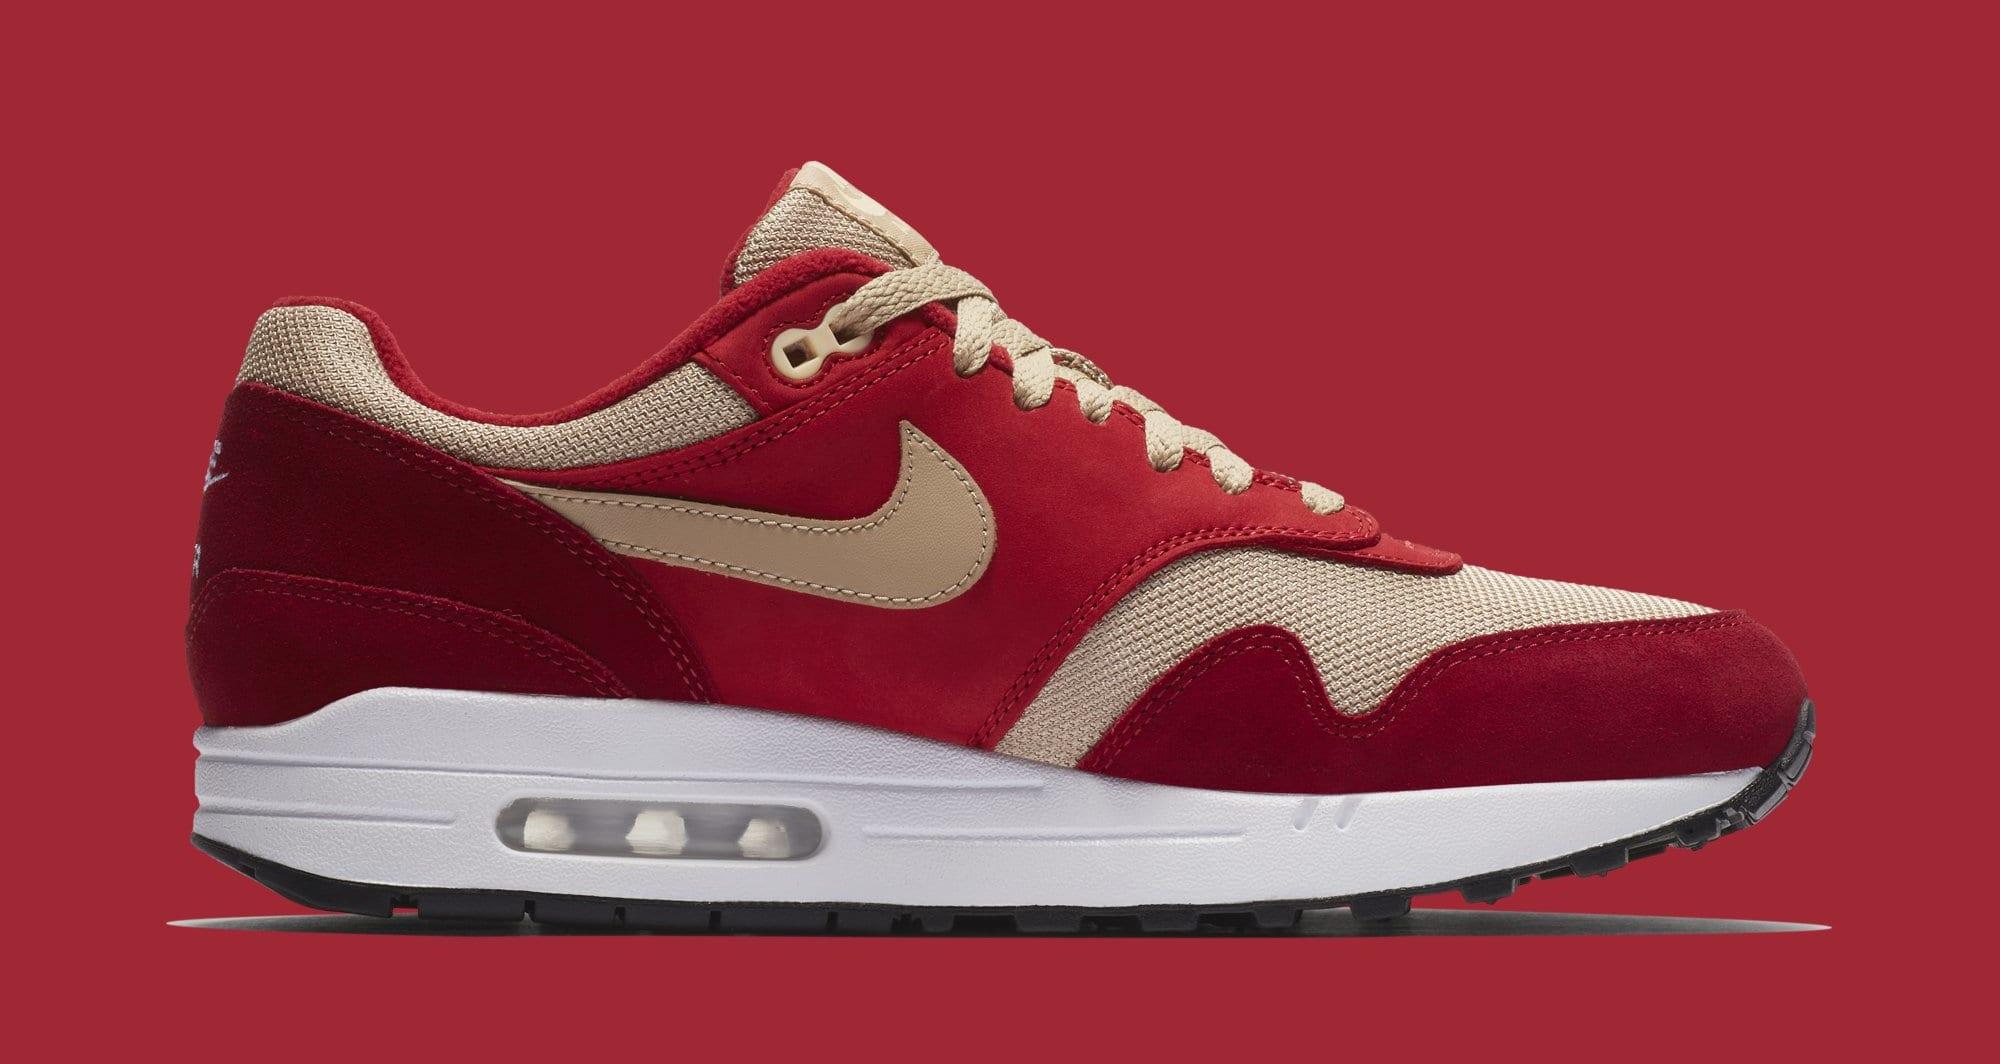 Atmos x Nike Air Max 1 'Red Curry' 908366-600 (Medial)